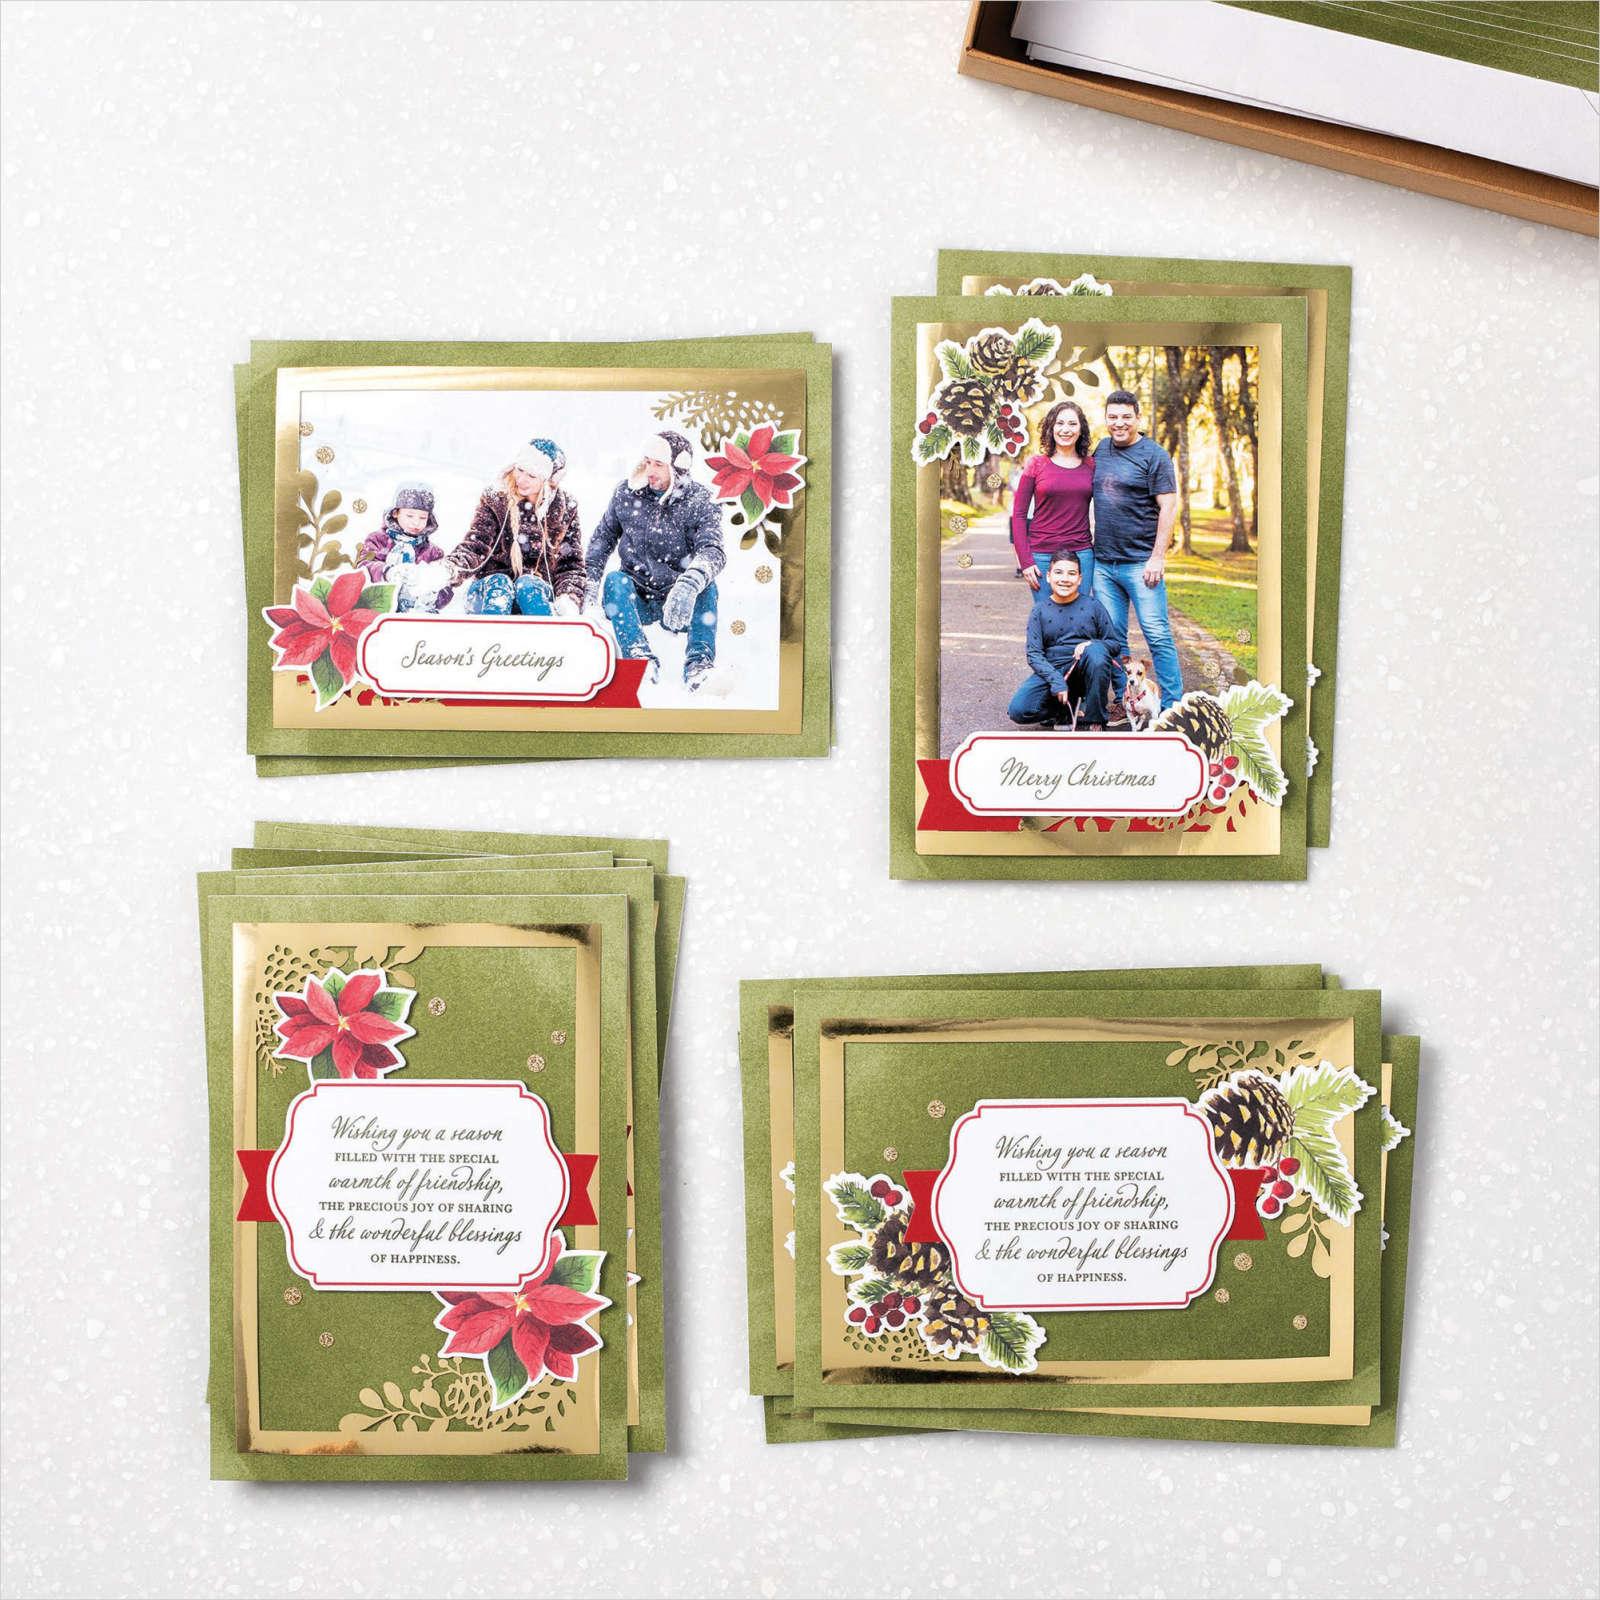 JOY OF SHARING CARD KIT (ENGLISH)